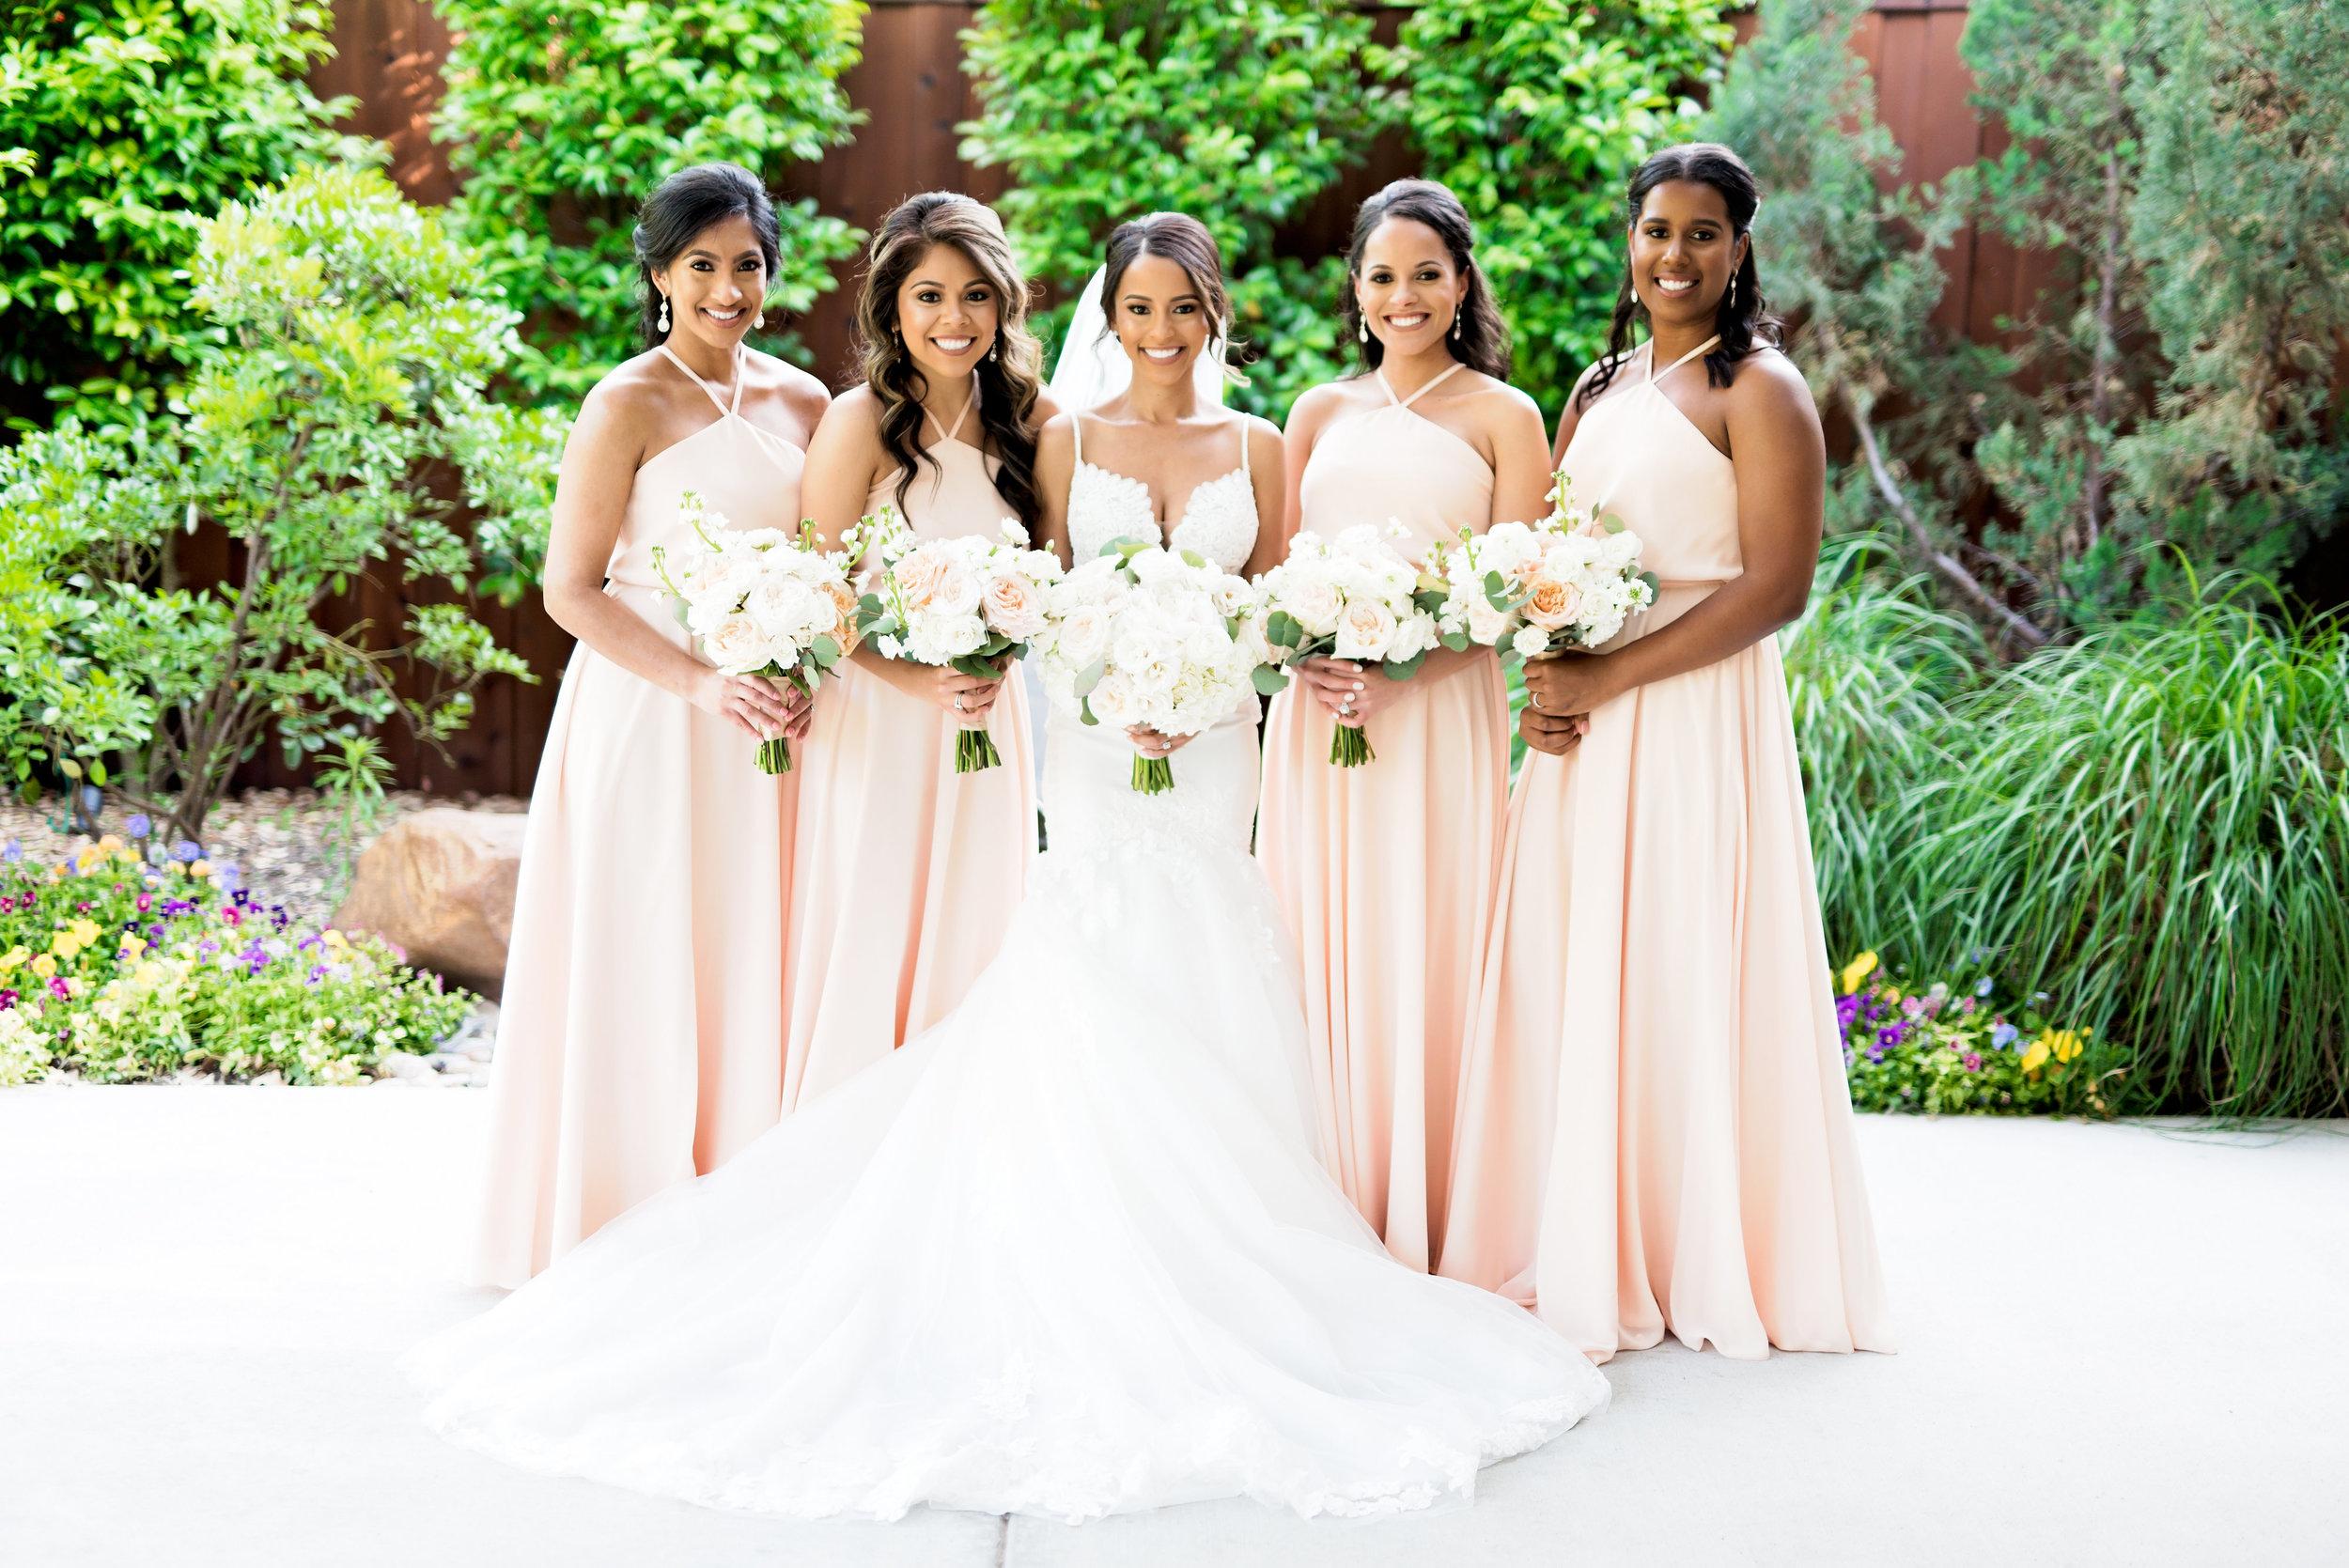 Pharris Photography- Texas Wedding- Noelle + Sullivan- Bridesmaids- Bridal Party- Bride